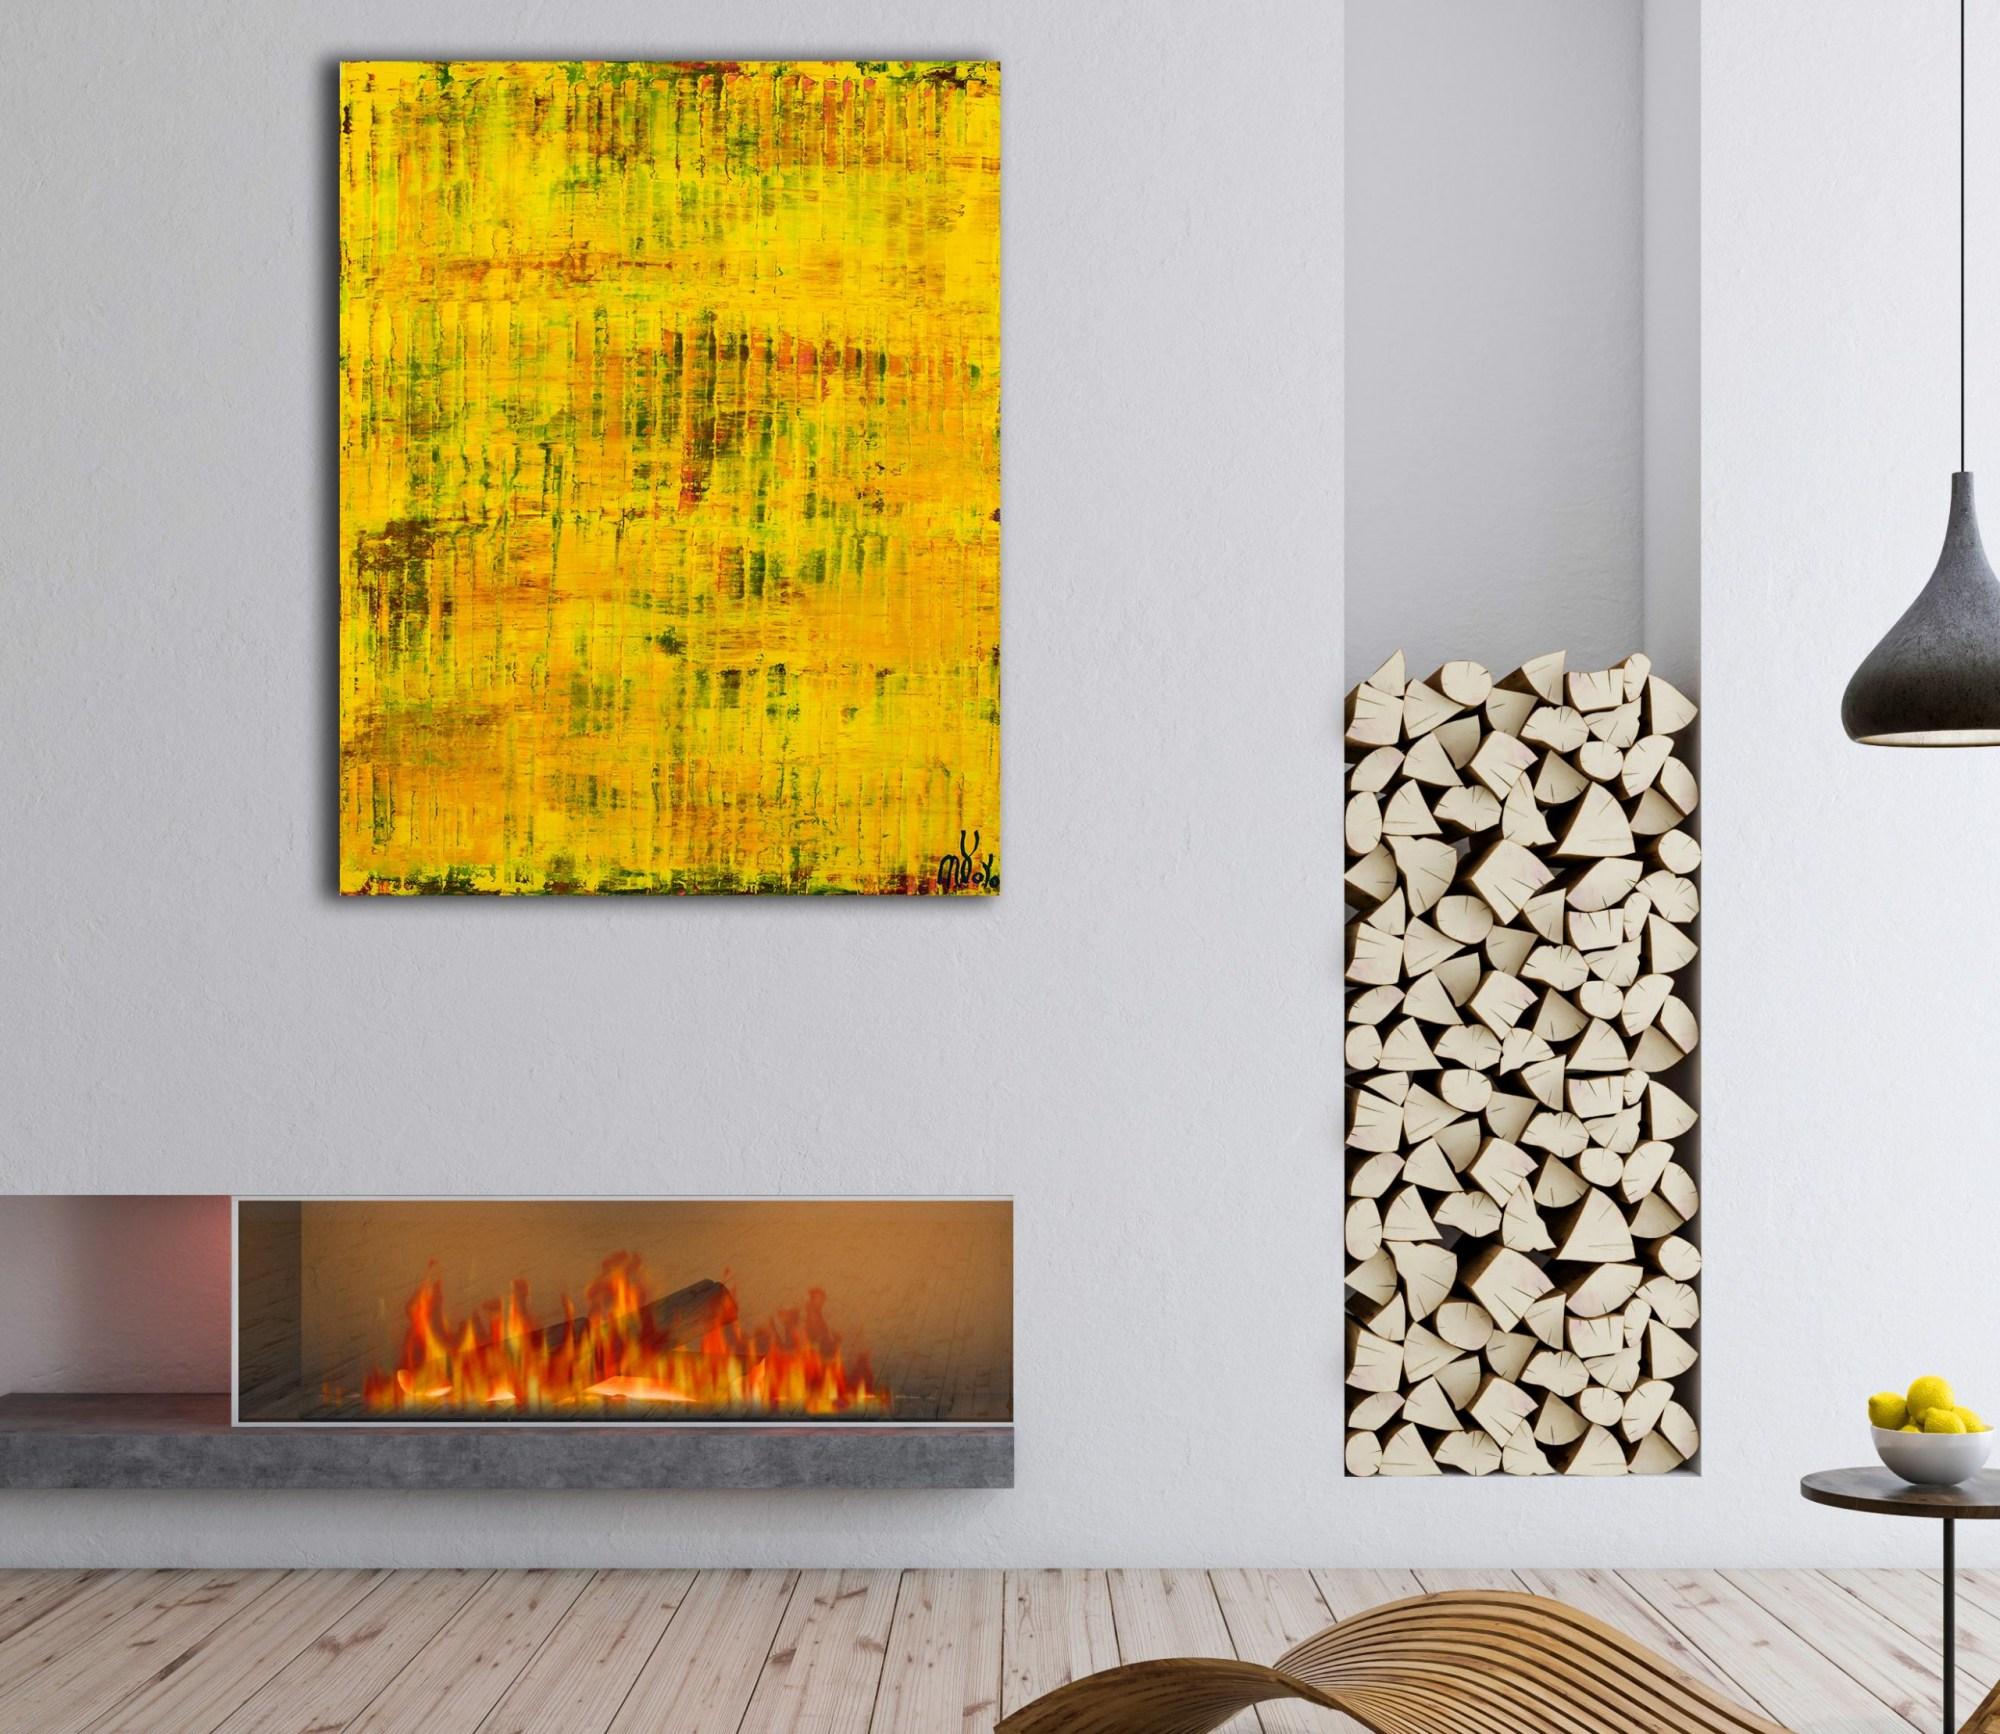 Room example / Yellow Reunion (Lost Lights) (2021) - 24x36 inches /Artist Nestor Toro